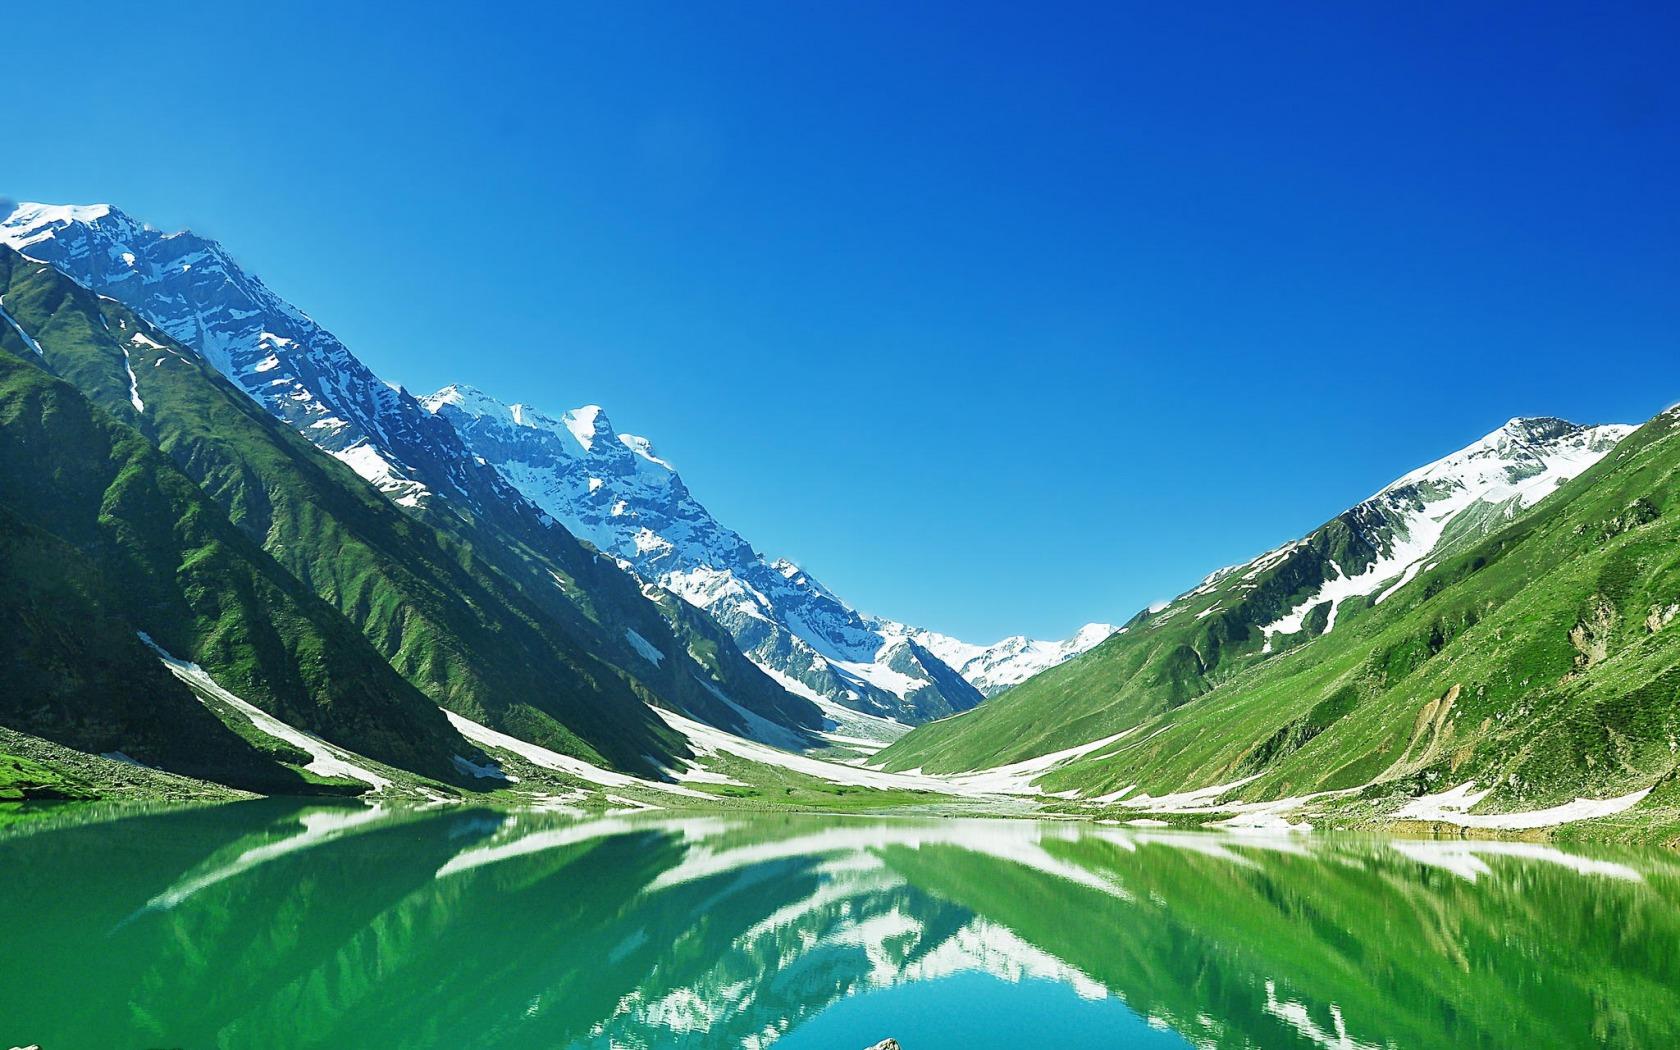 Landscape Hill Lake Nature Fjord Valley Mountain Pass Alps Pakistan Plateau Ridge 2014 Meadow Mountainous